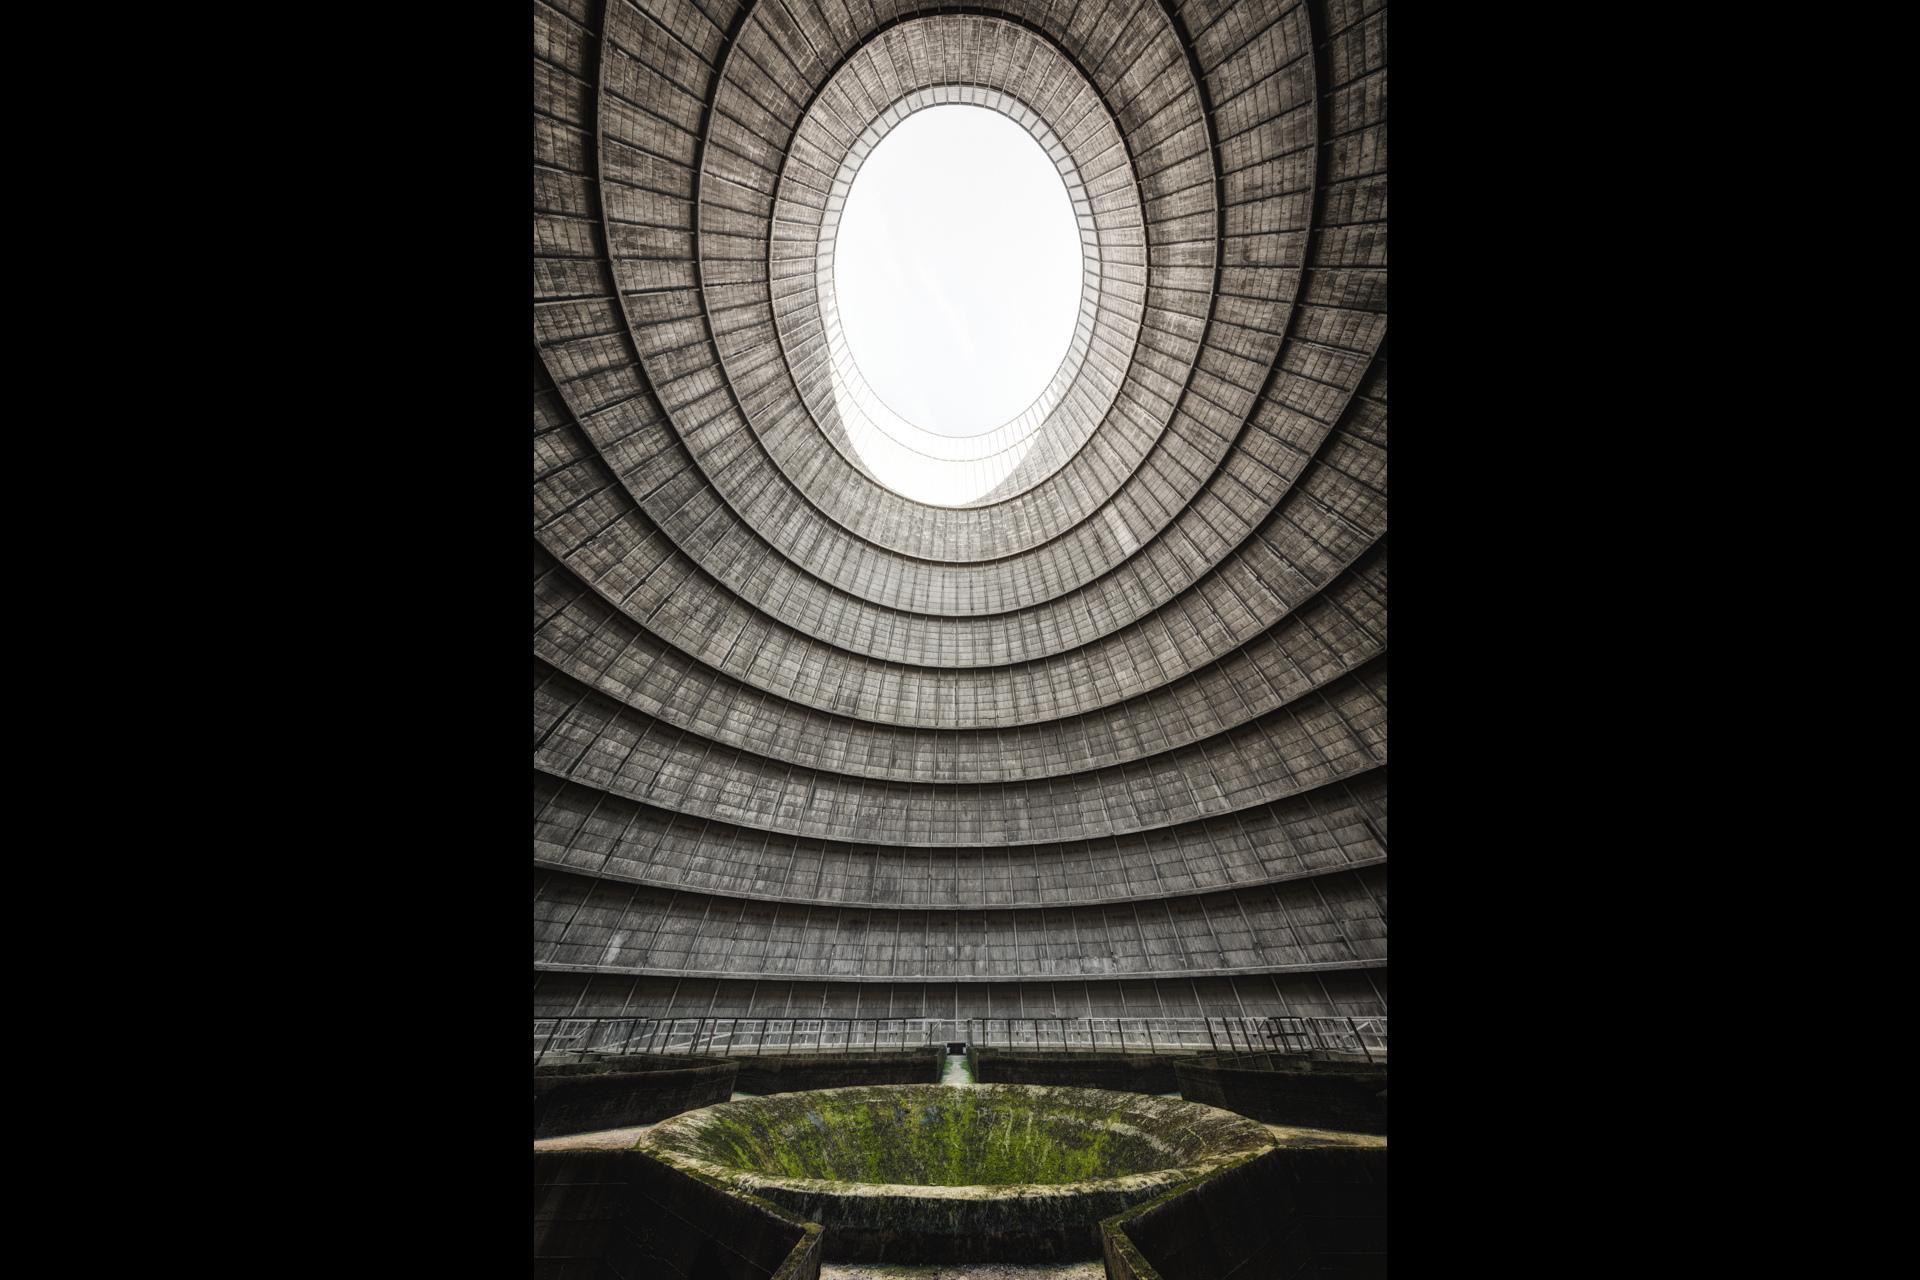 Urban Exploration - Cooling Tower IM - Circular Prison